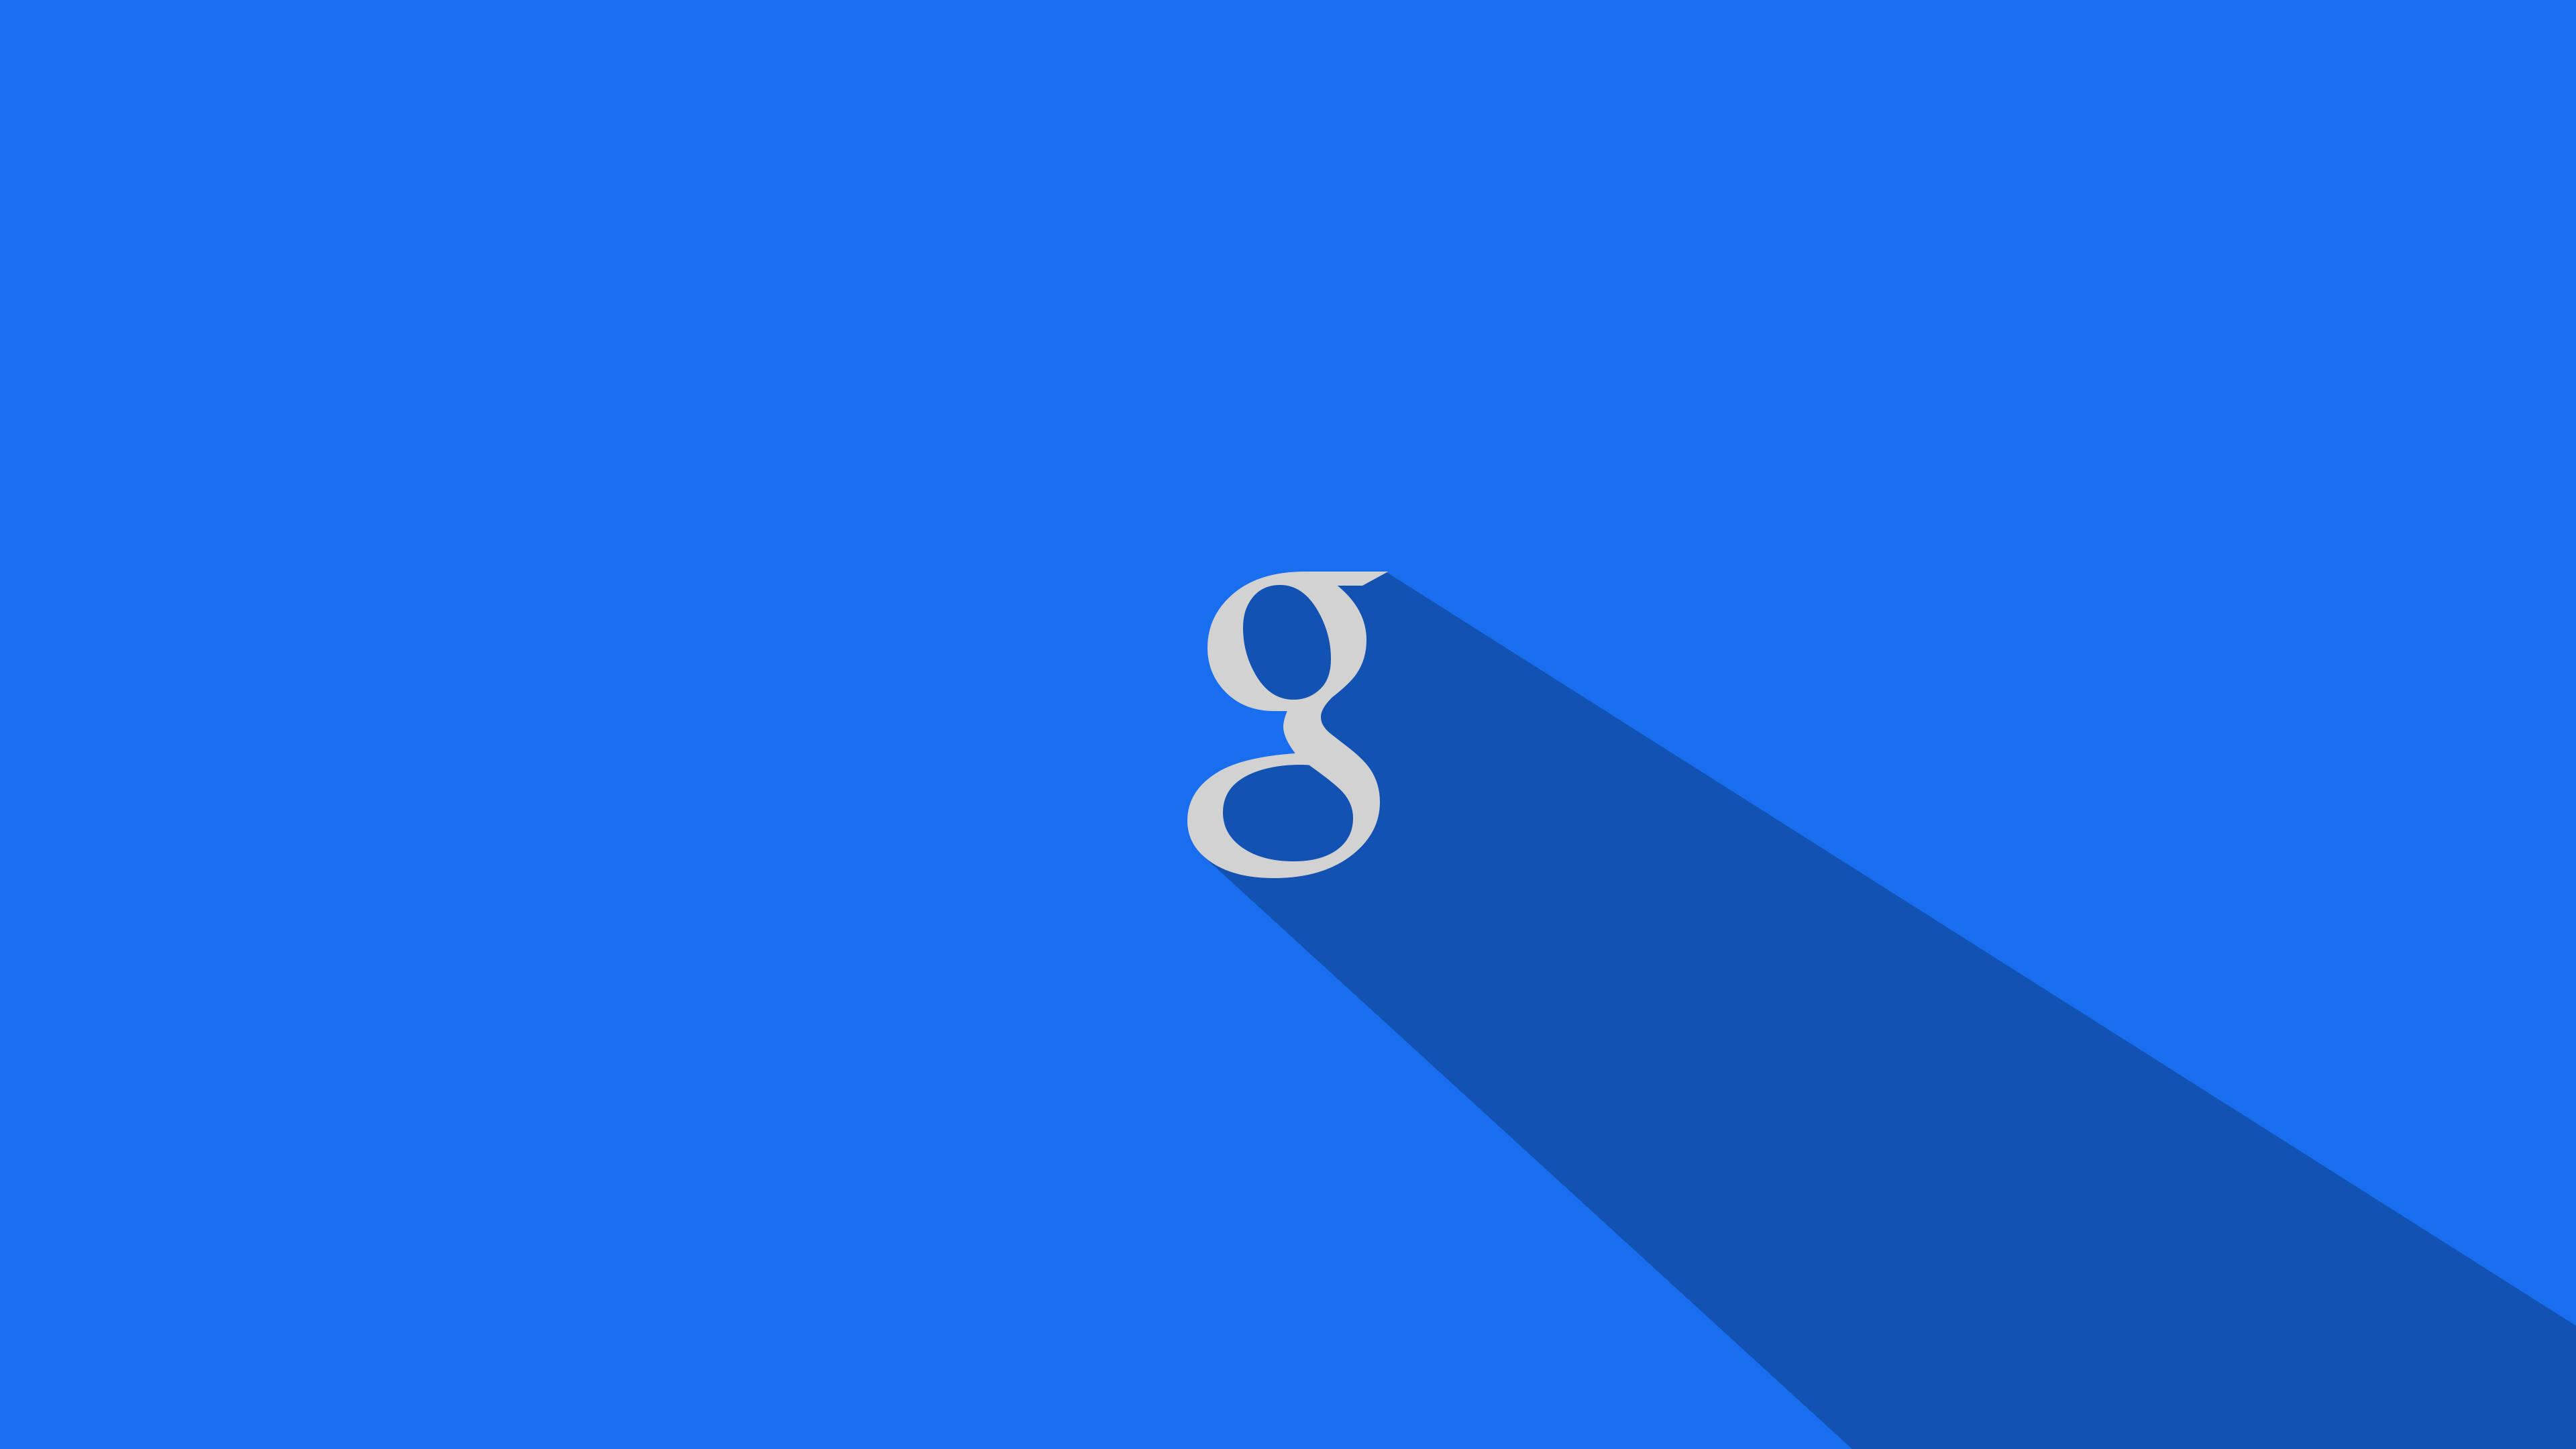 Google Wallpaper Desktop Background.